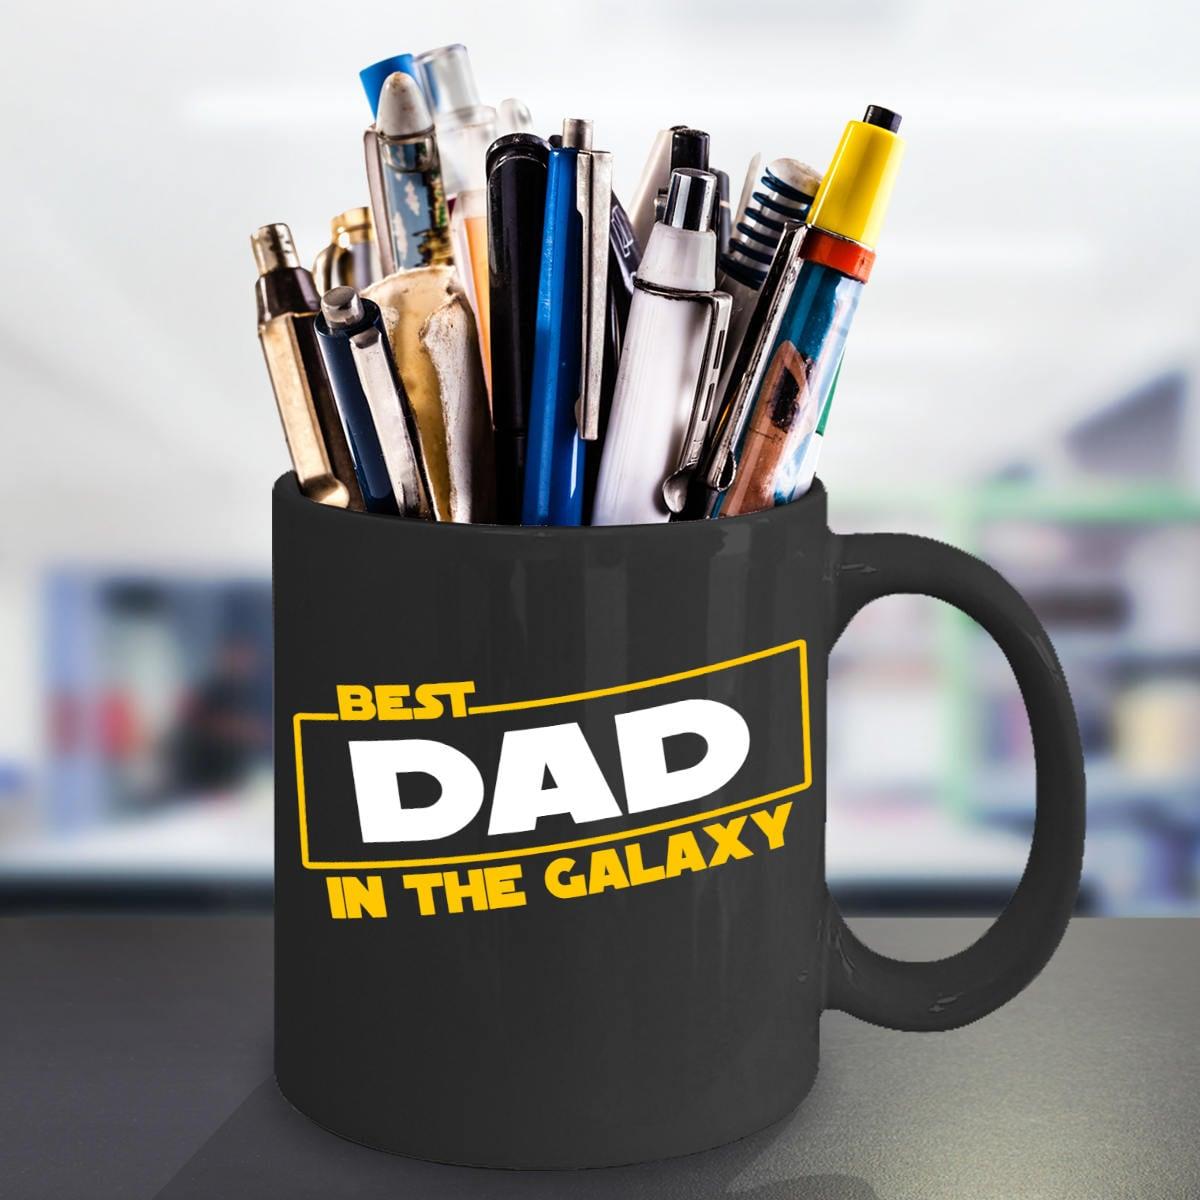 Best Dad in the Galaxy, Dad Gift Mug, Star Wars Gift, Coffee Mug for Dad, Fathers Day Mug, New Dad Gift